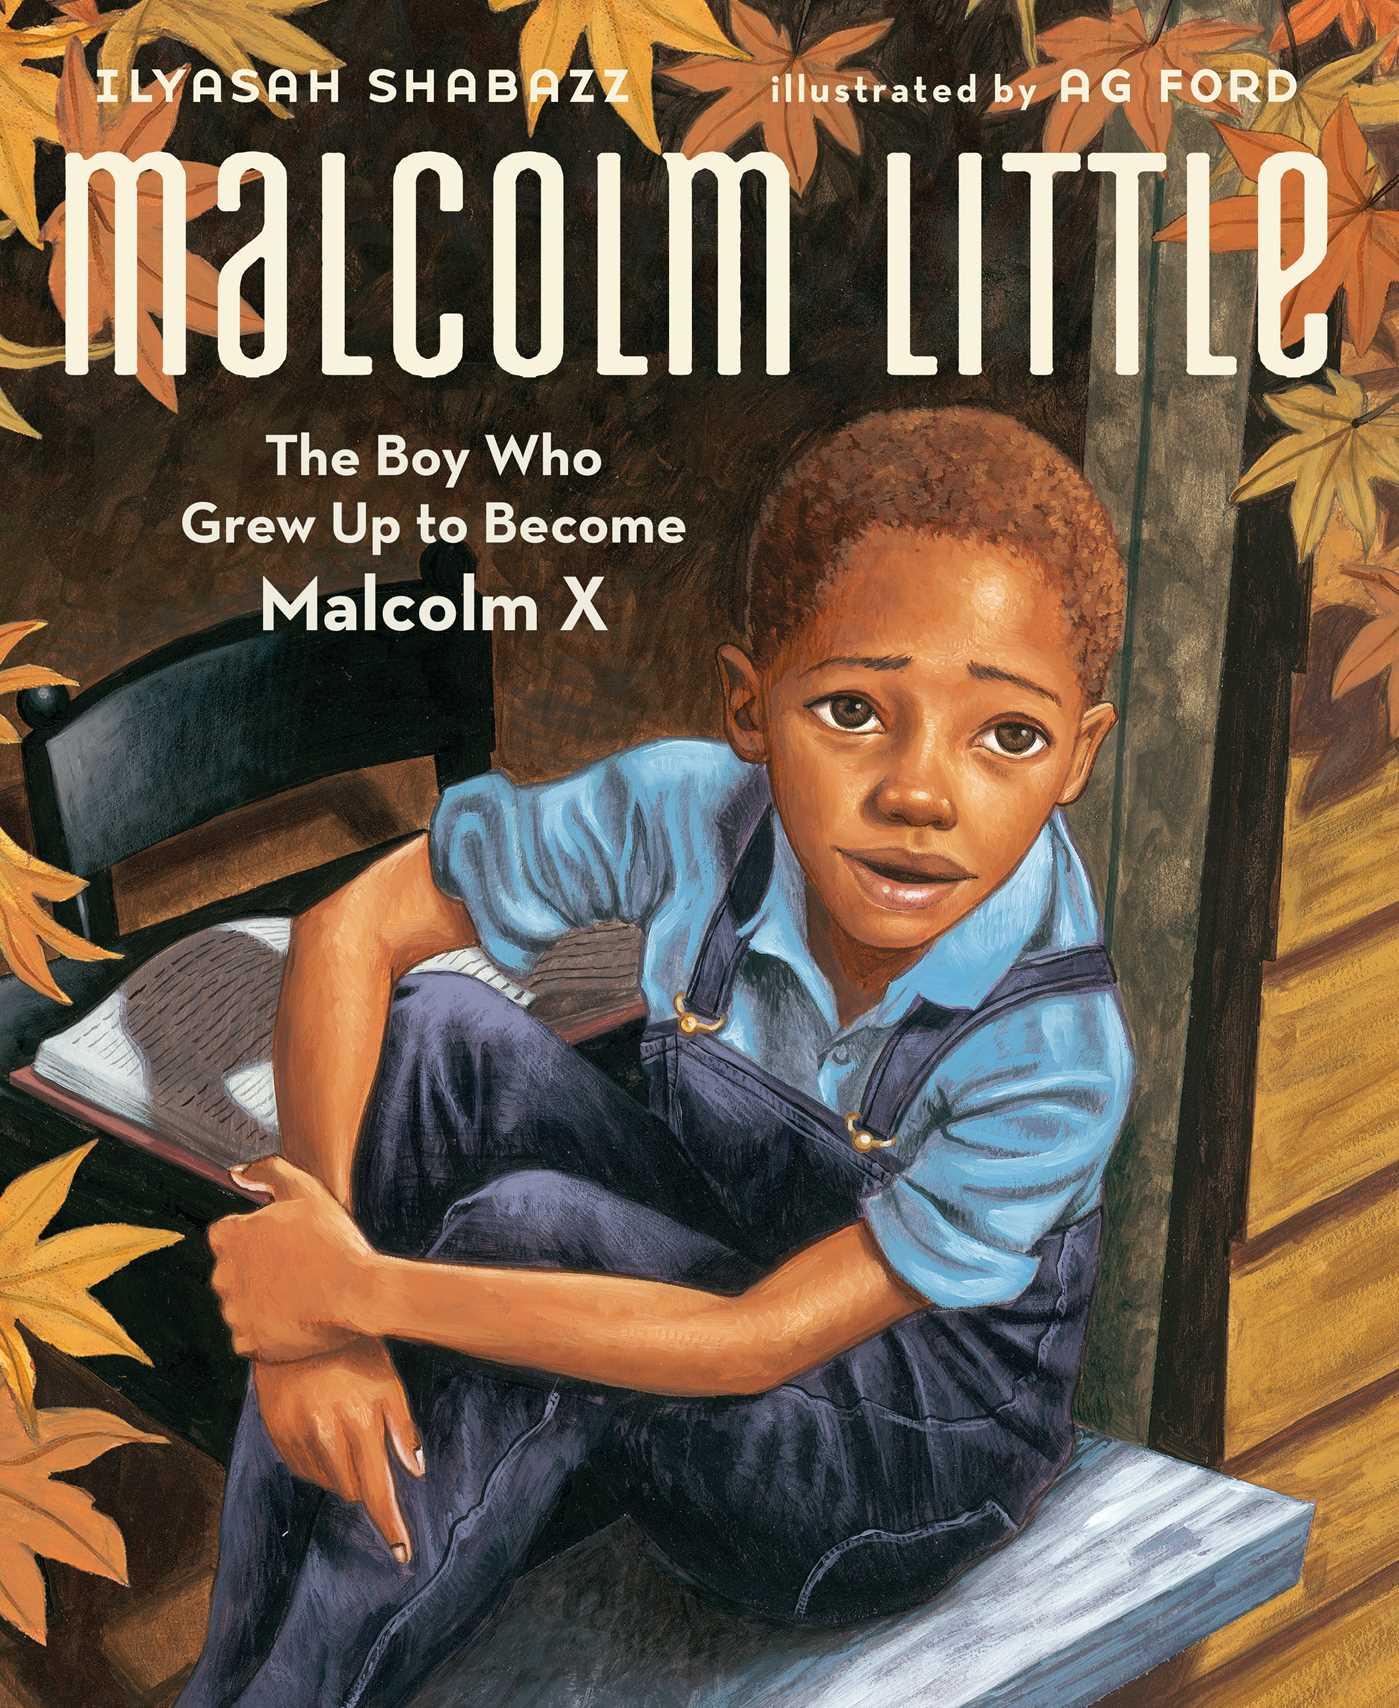 Malcolm little 9781442412163 hr